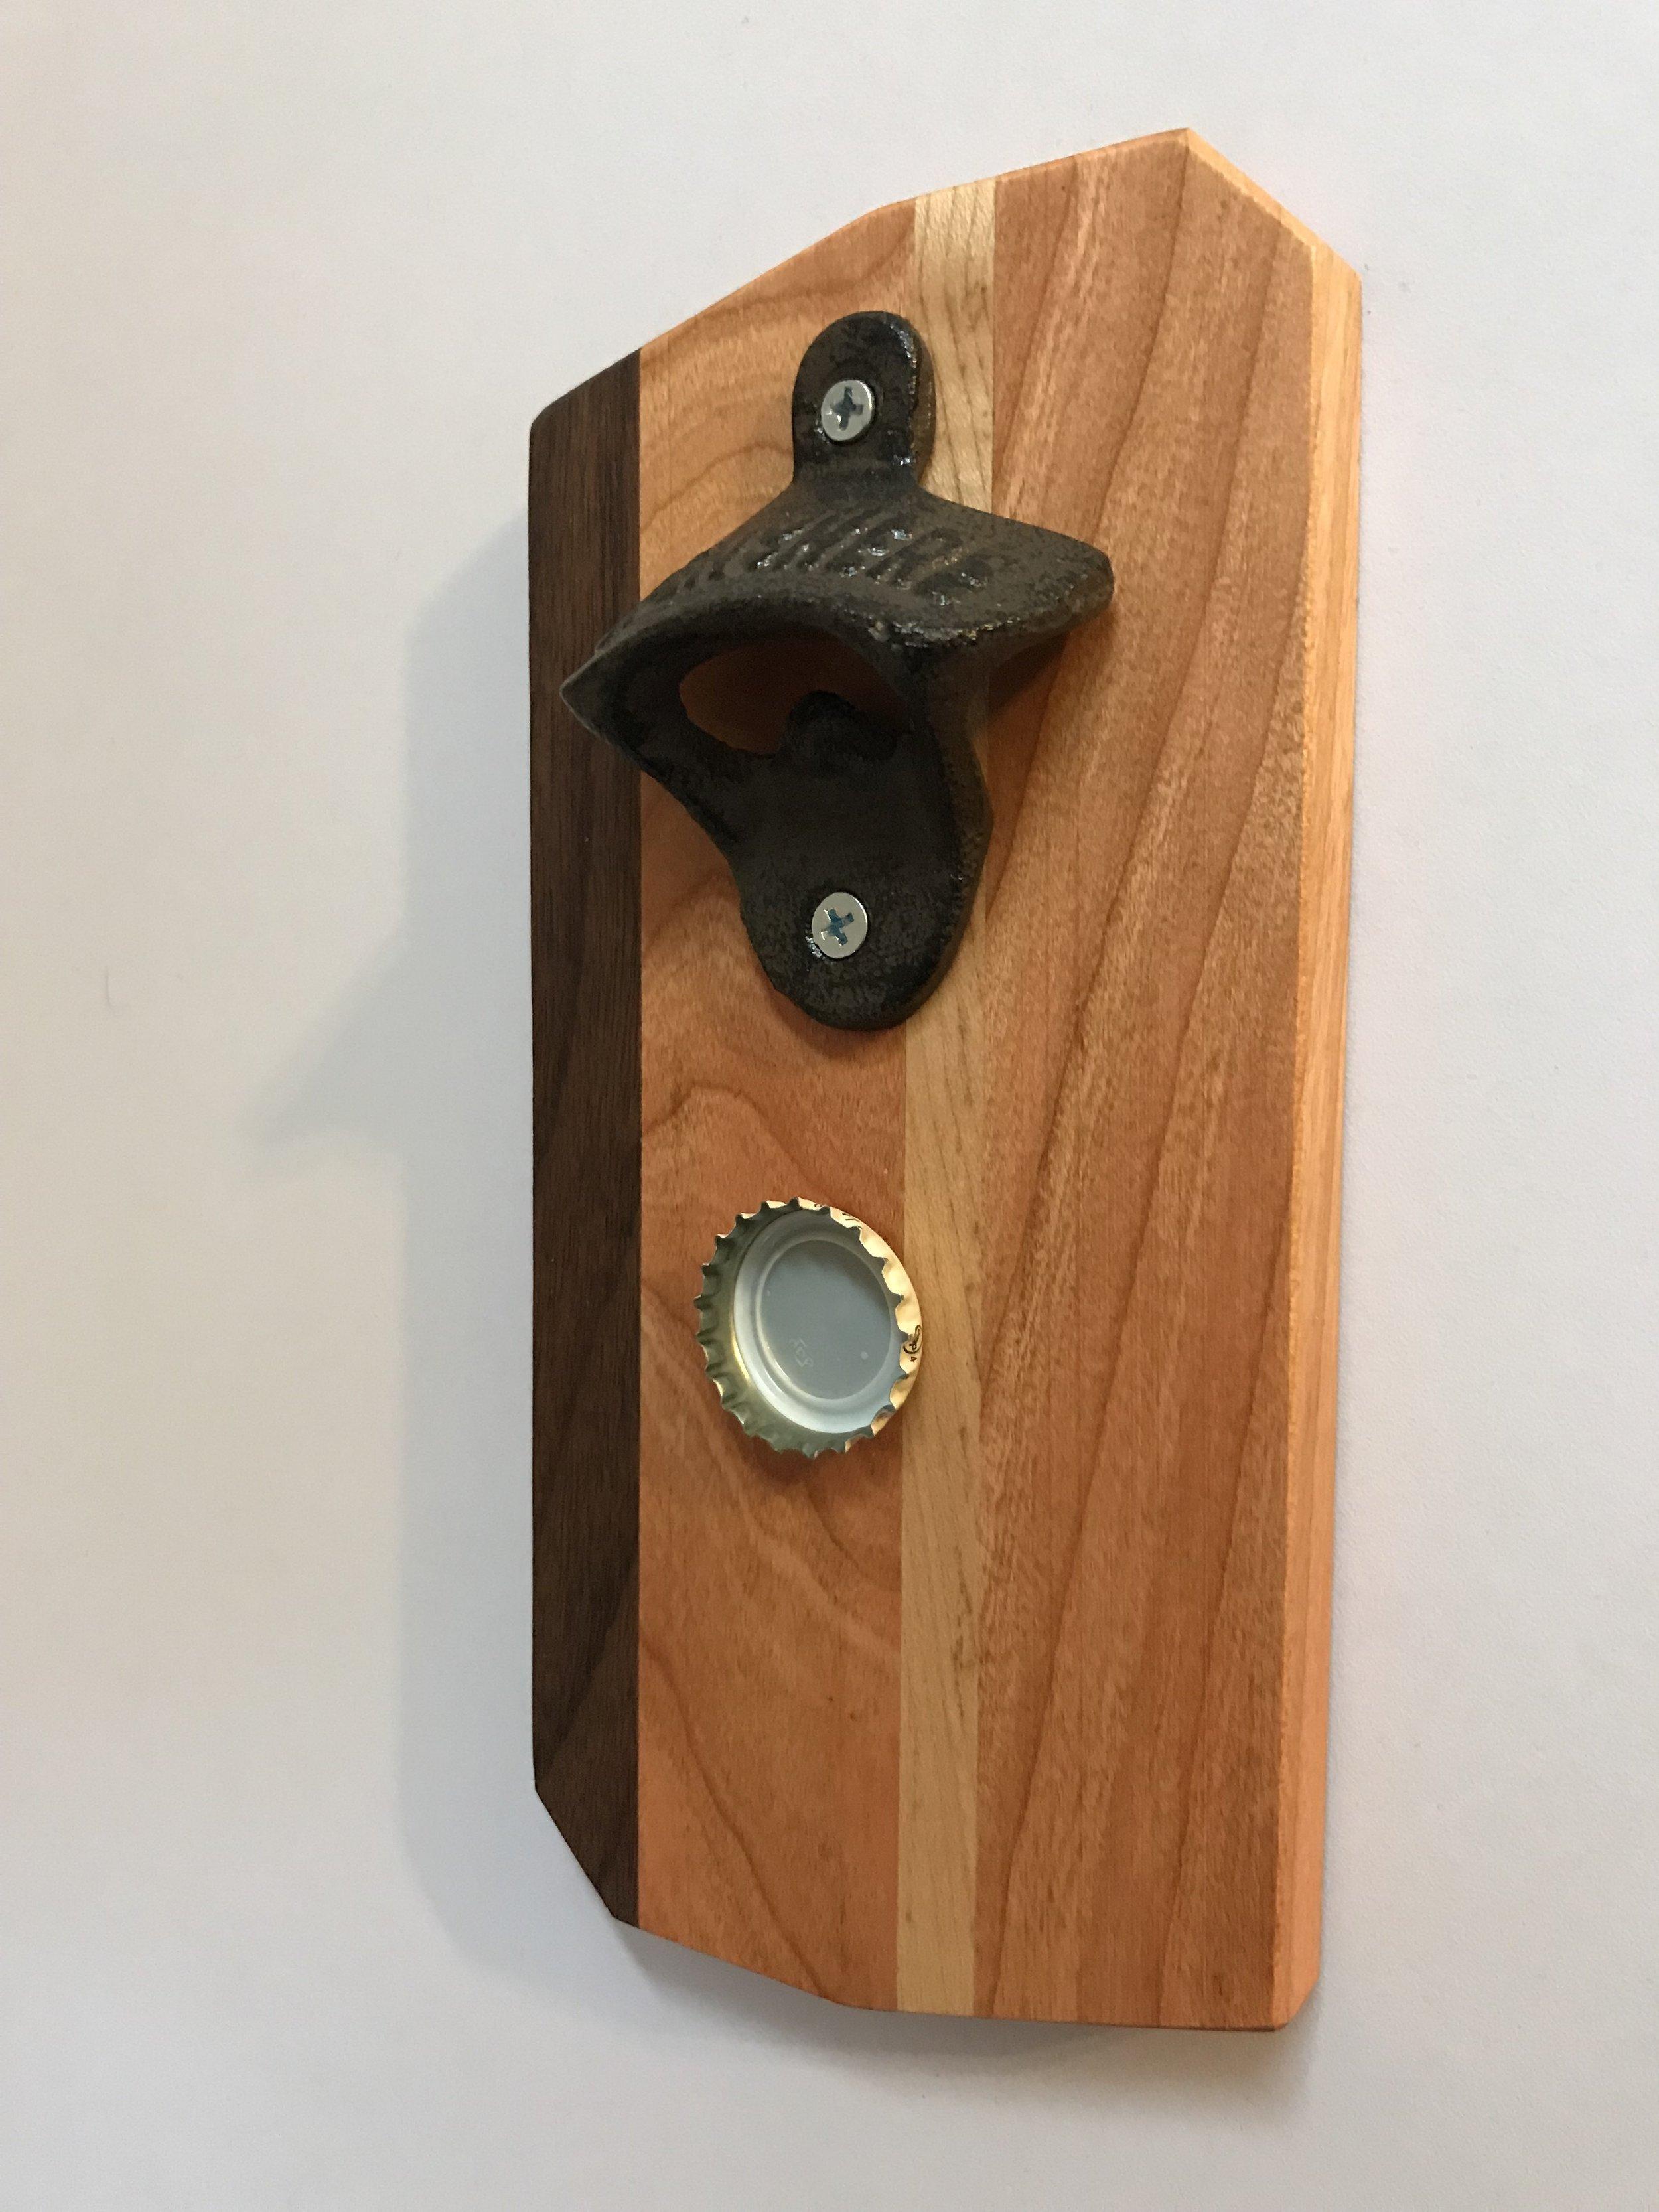 Image of: Wall Mounted Bottle Opener Sam Falco Design